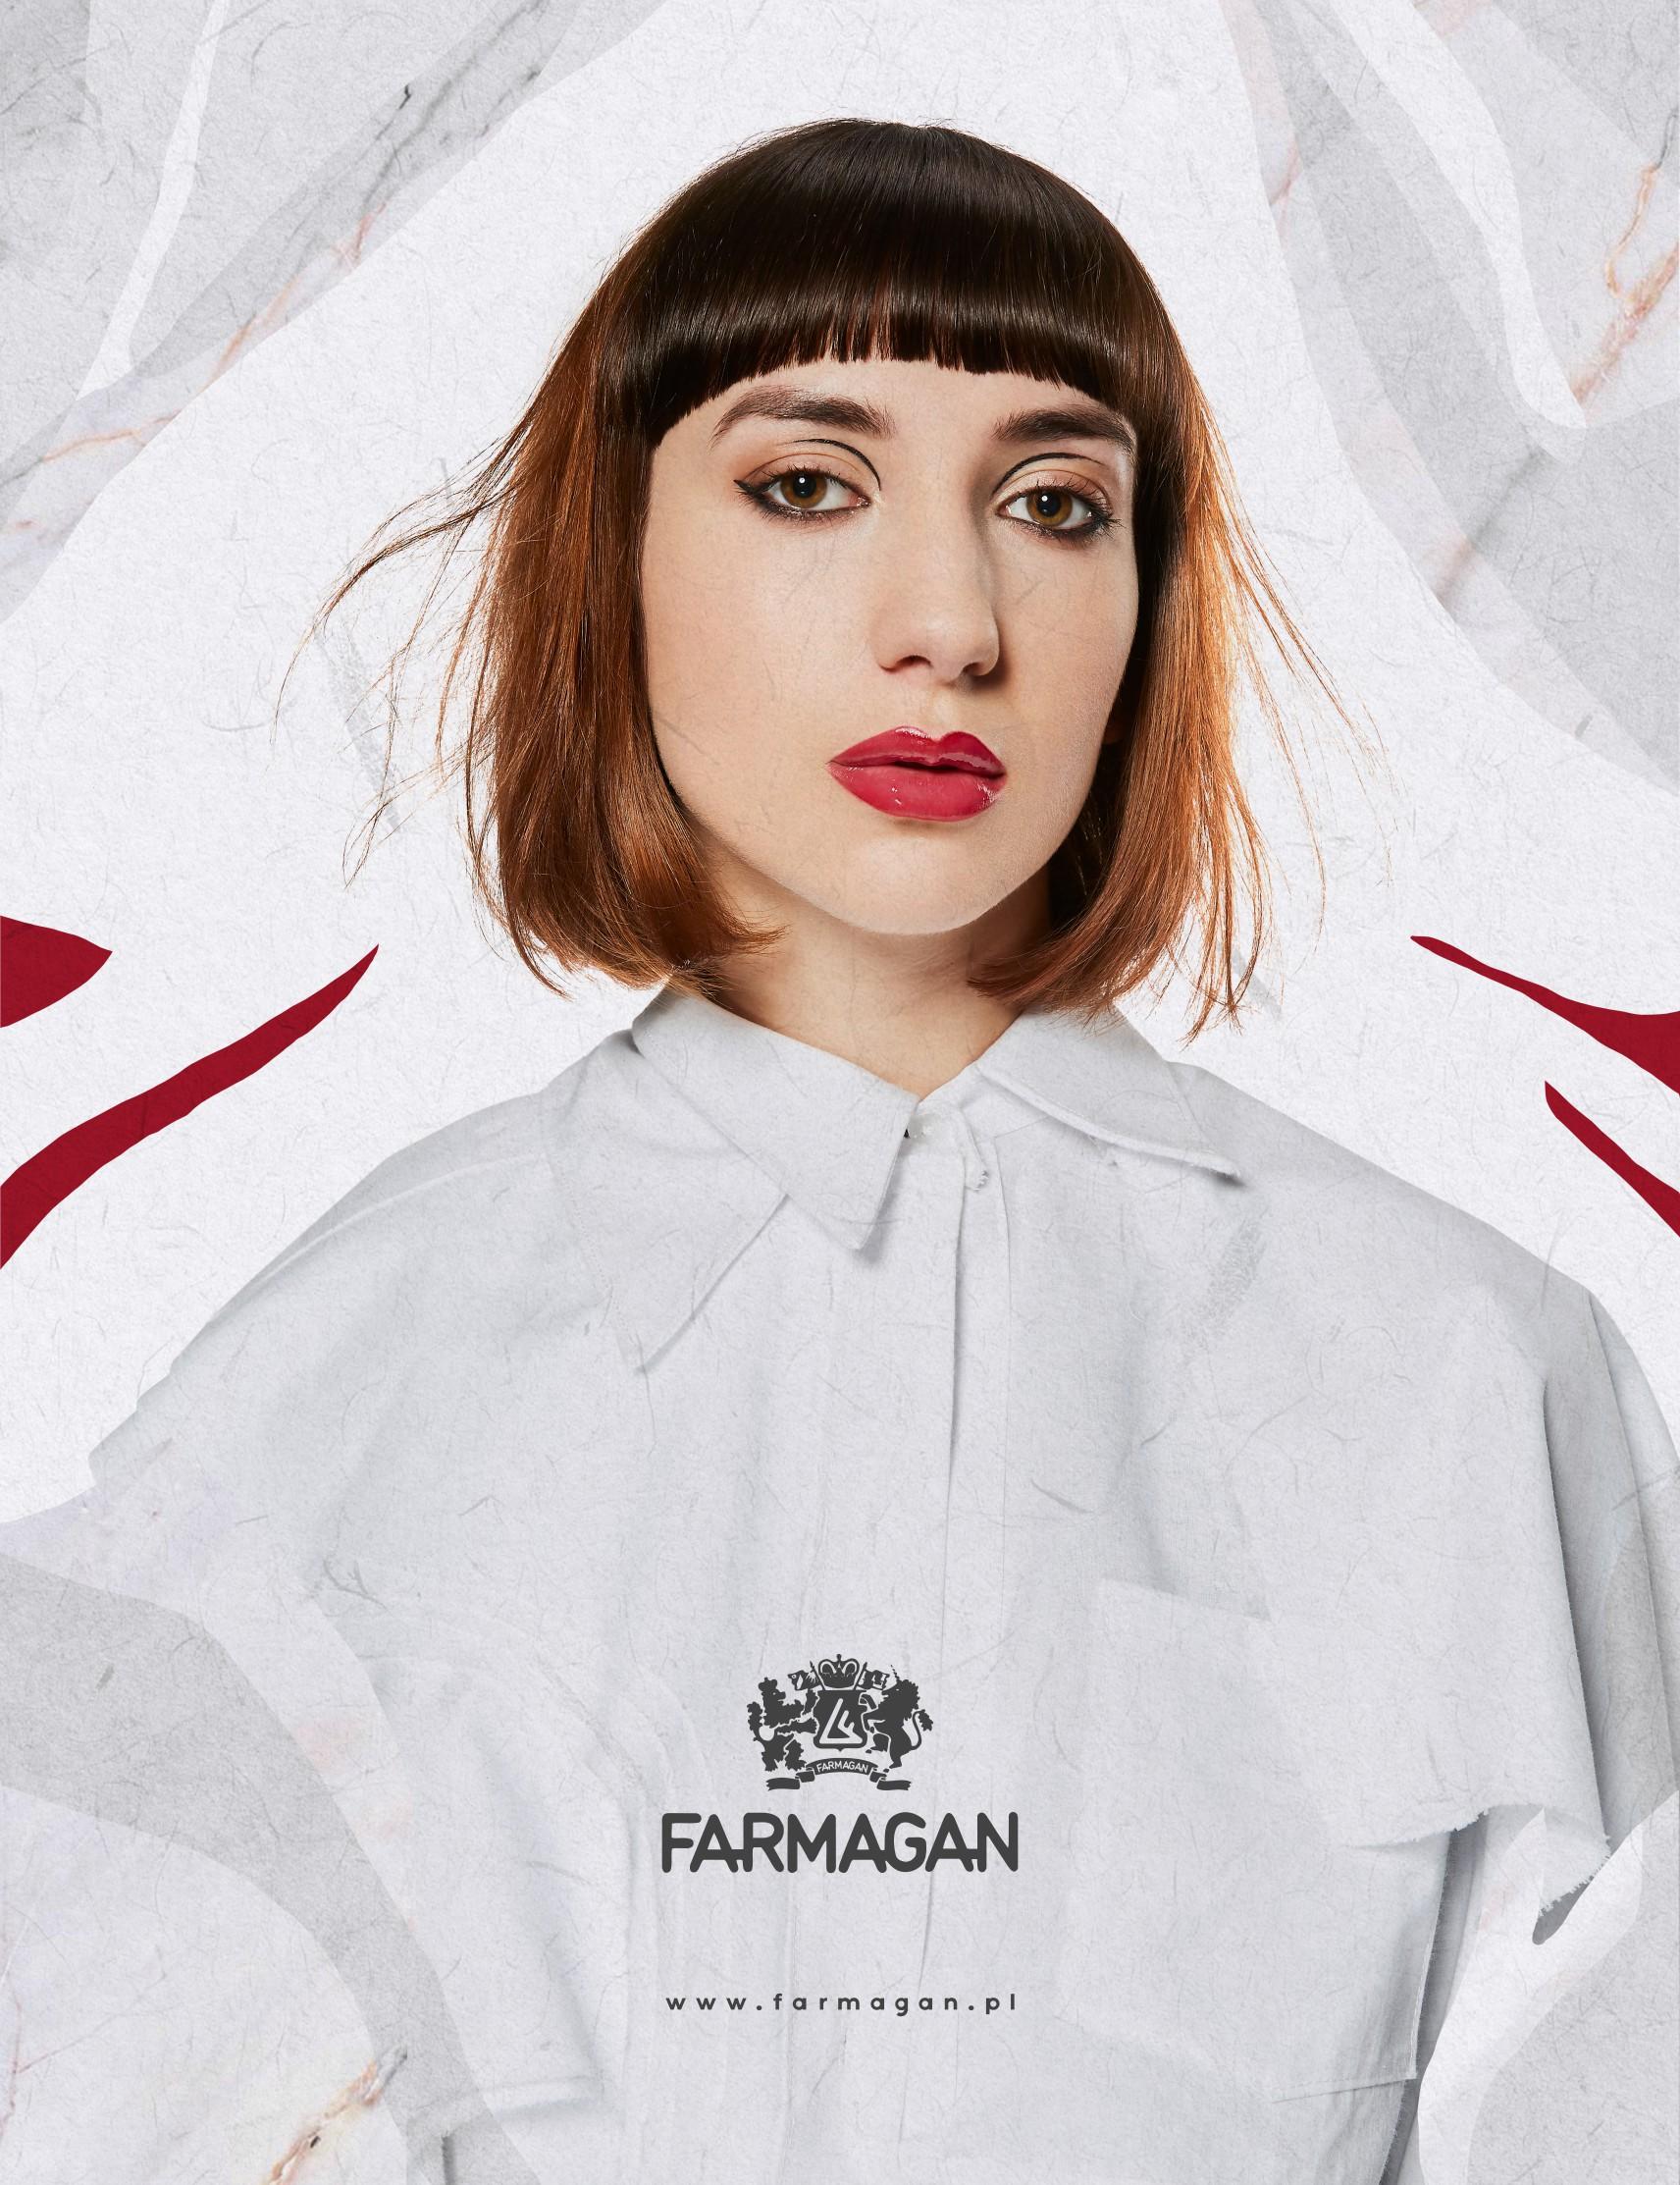 farmagan-A2